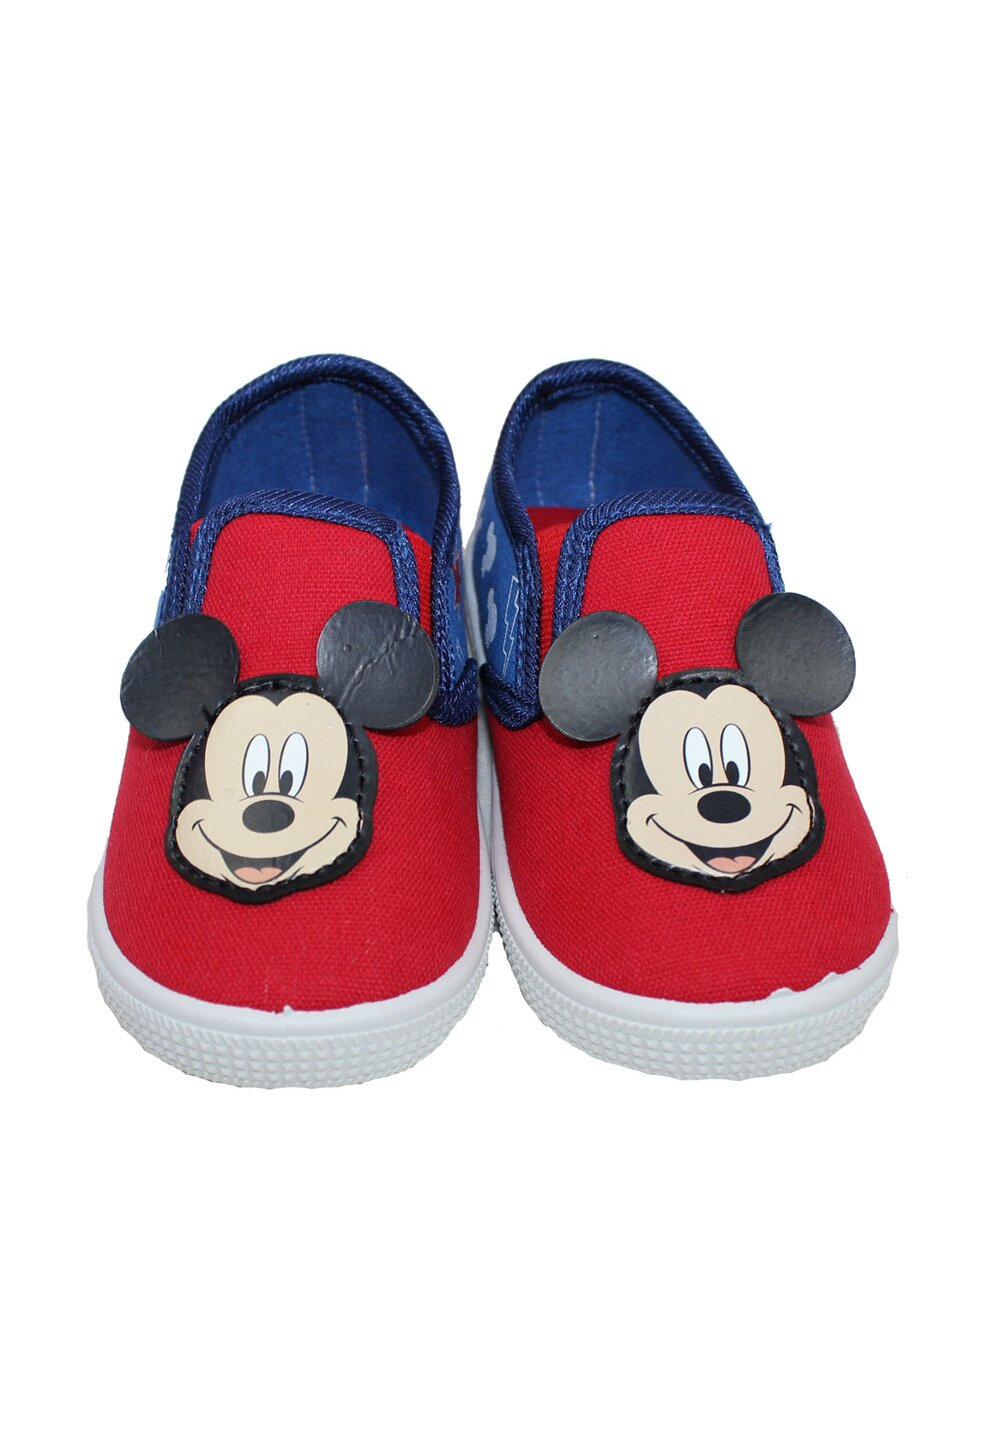 Incaltaminte panza, Mickey Mouse, rosu cu albastru imagine